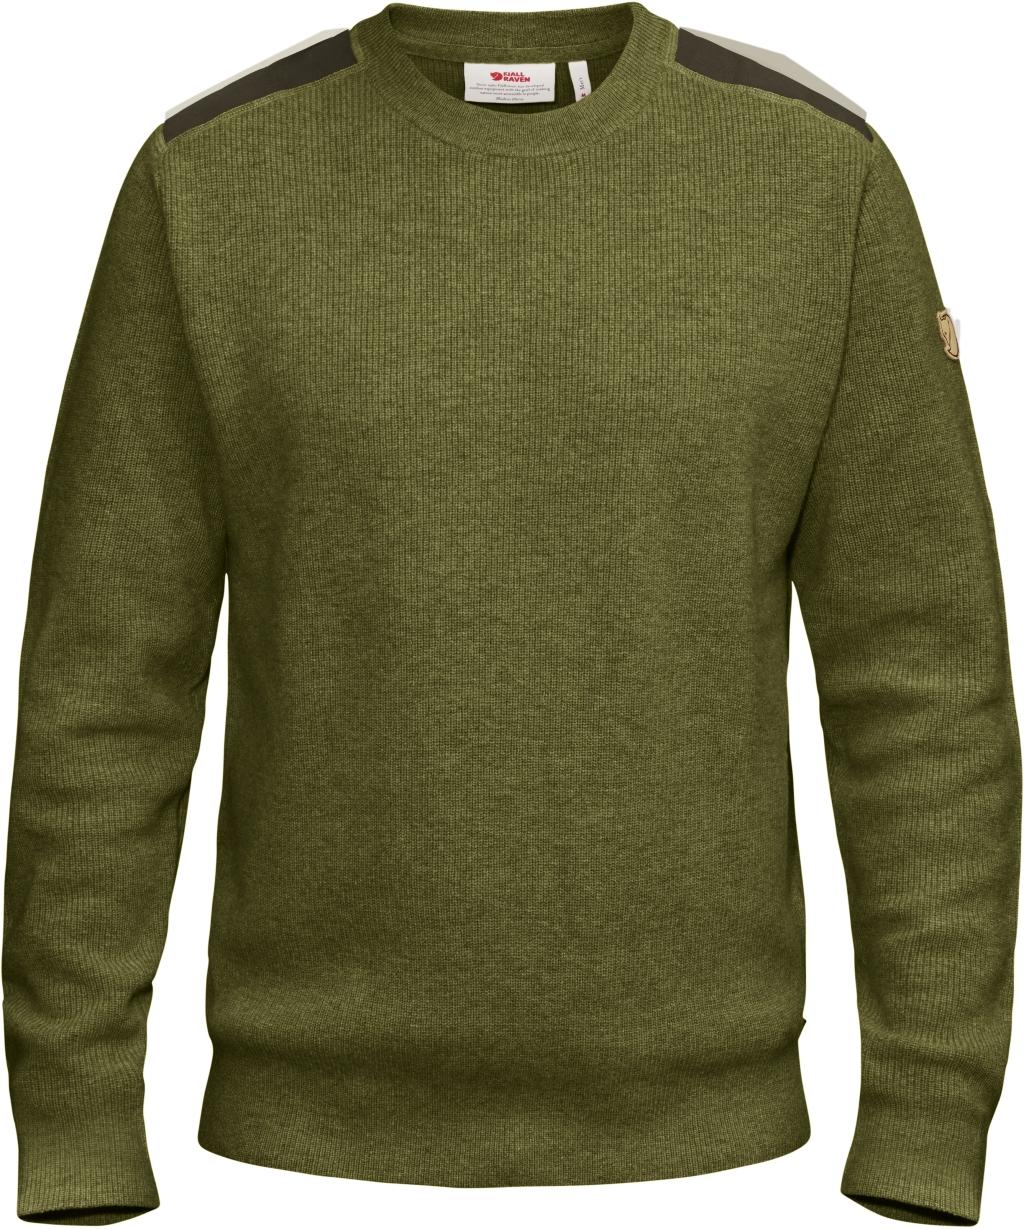 FjallRaven Sormland Crew Sweater Dark Olive-30